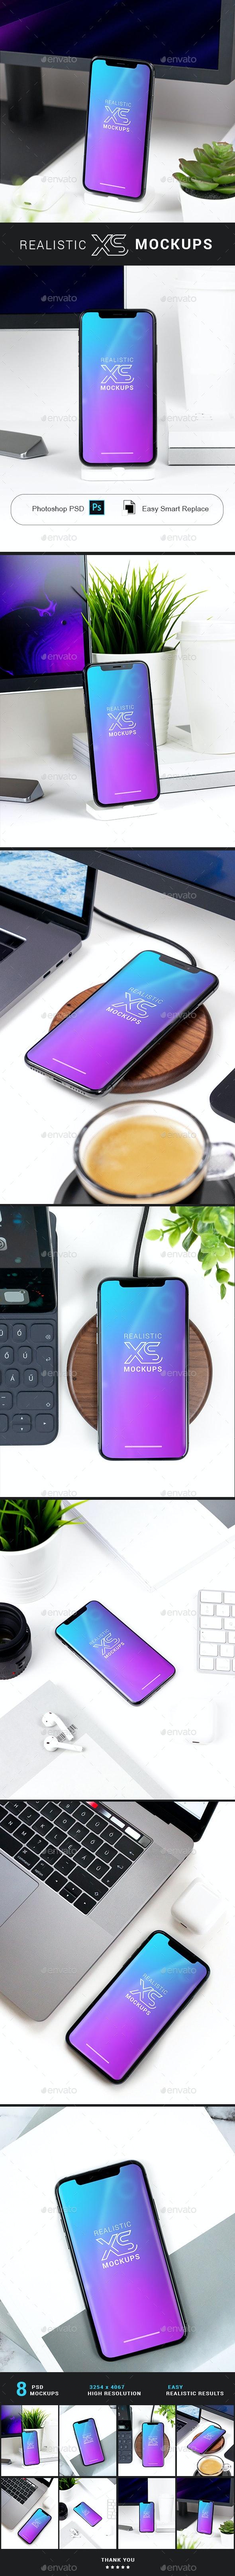 Realistic Phone XS Mockups - Mobile Displays